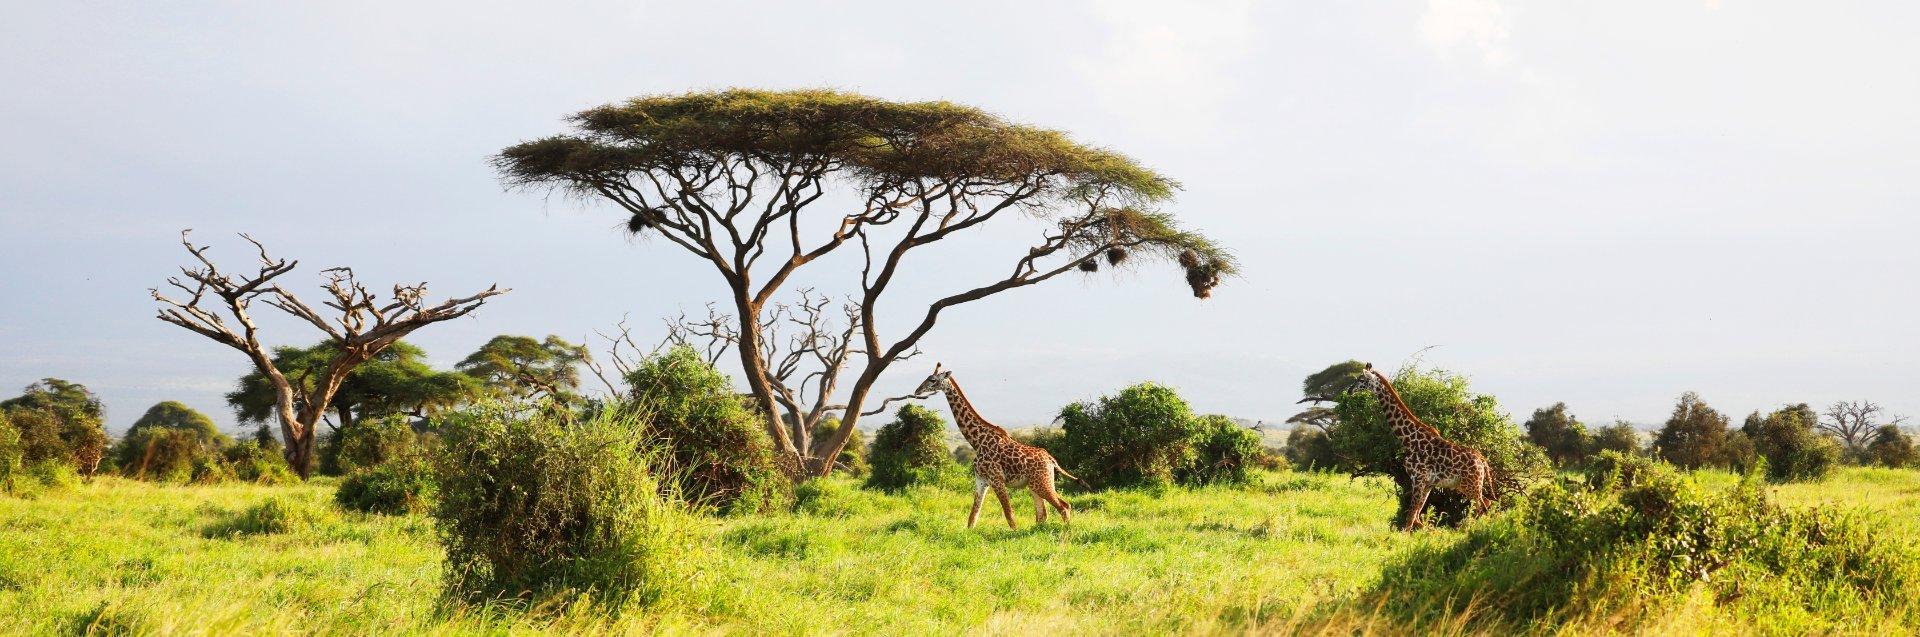 Programa de reforestación en Kenia